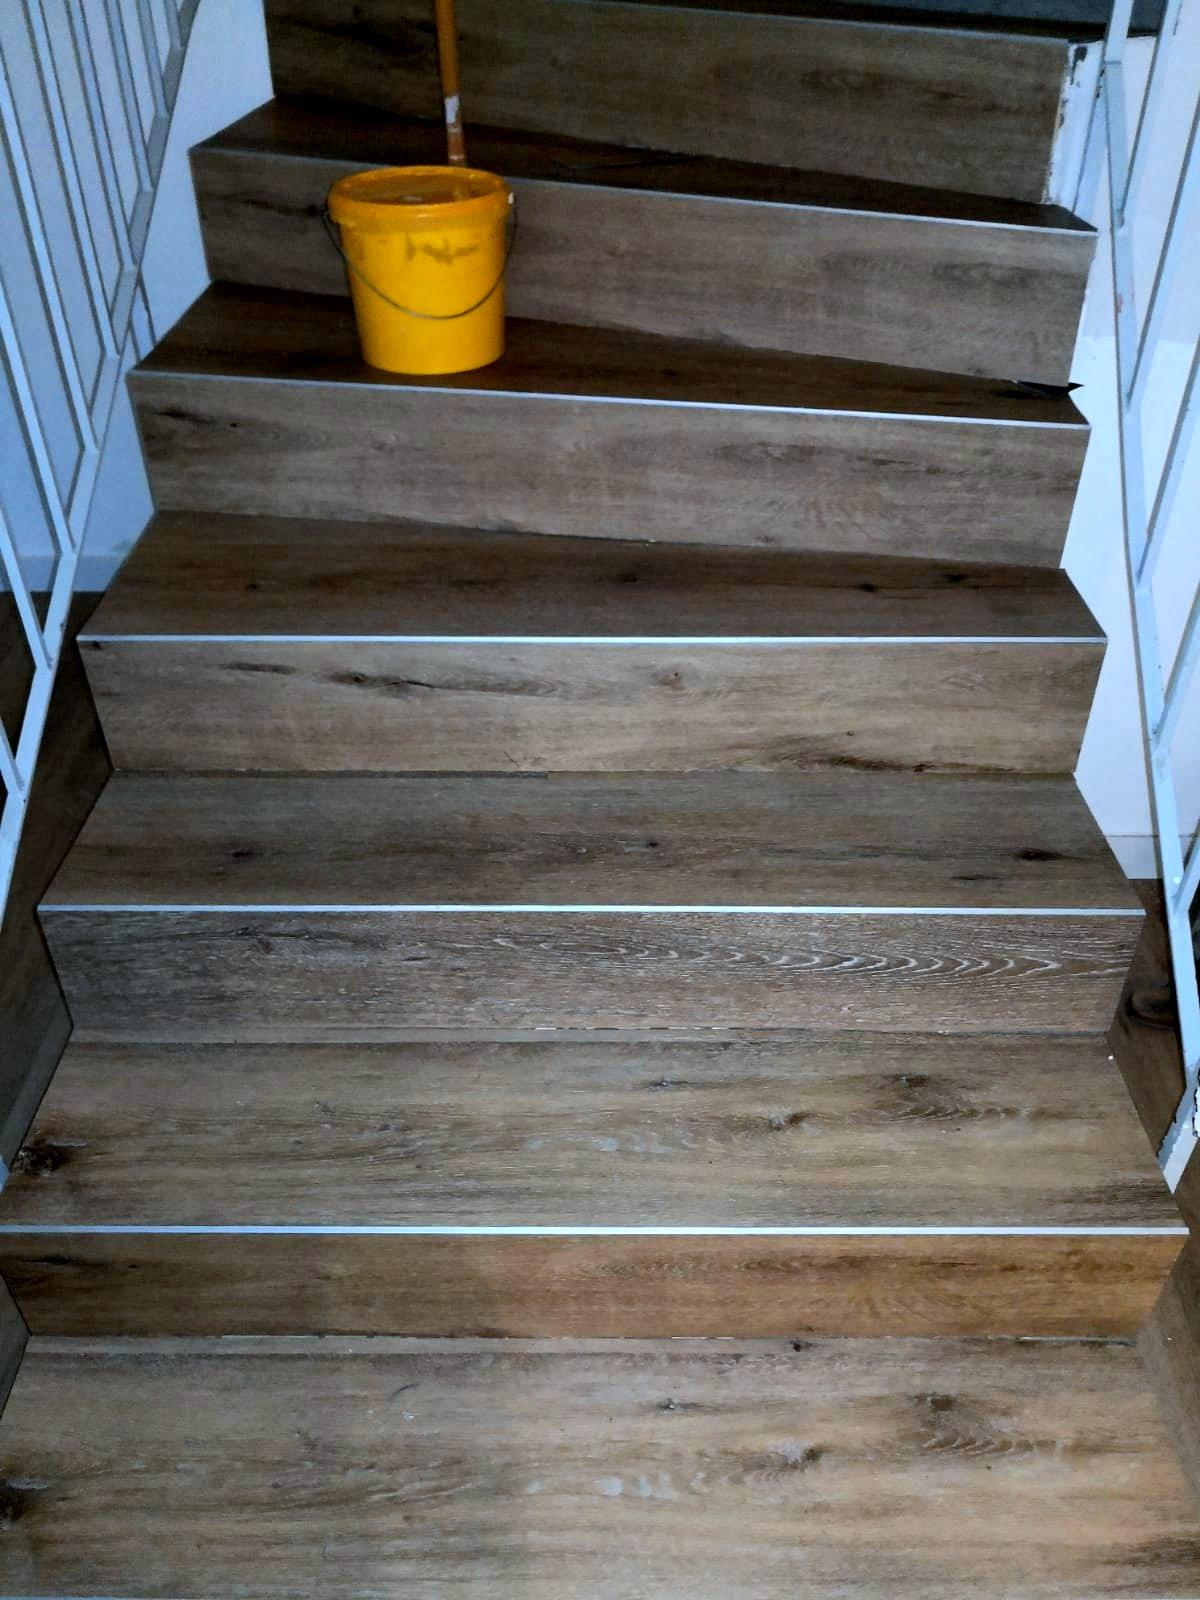 Mandic Baudekoration Treppe Bodenbelag (6)